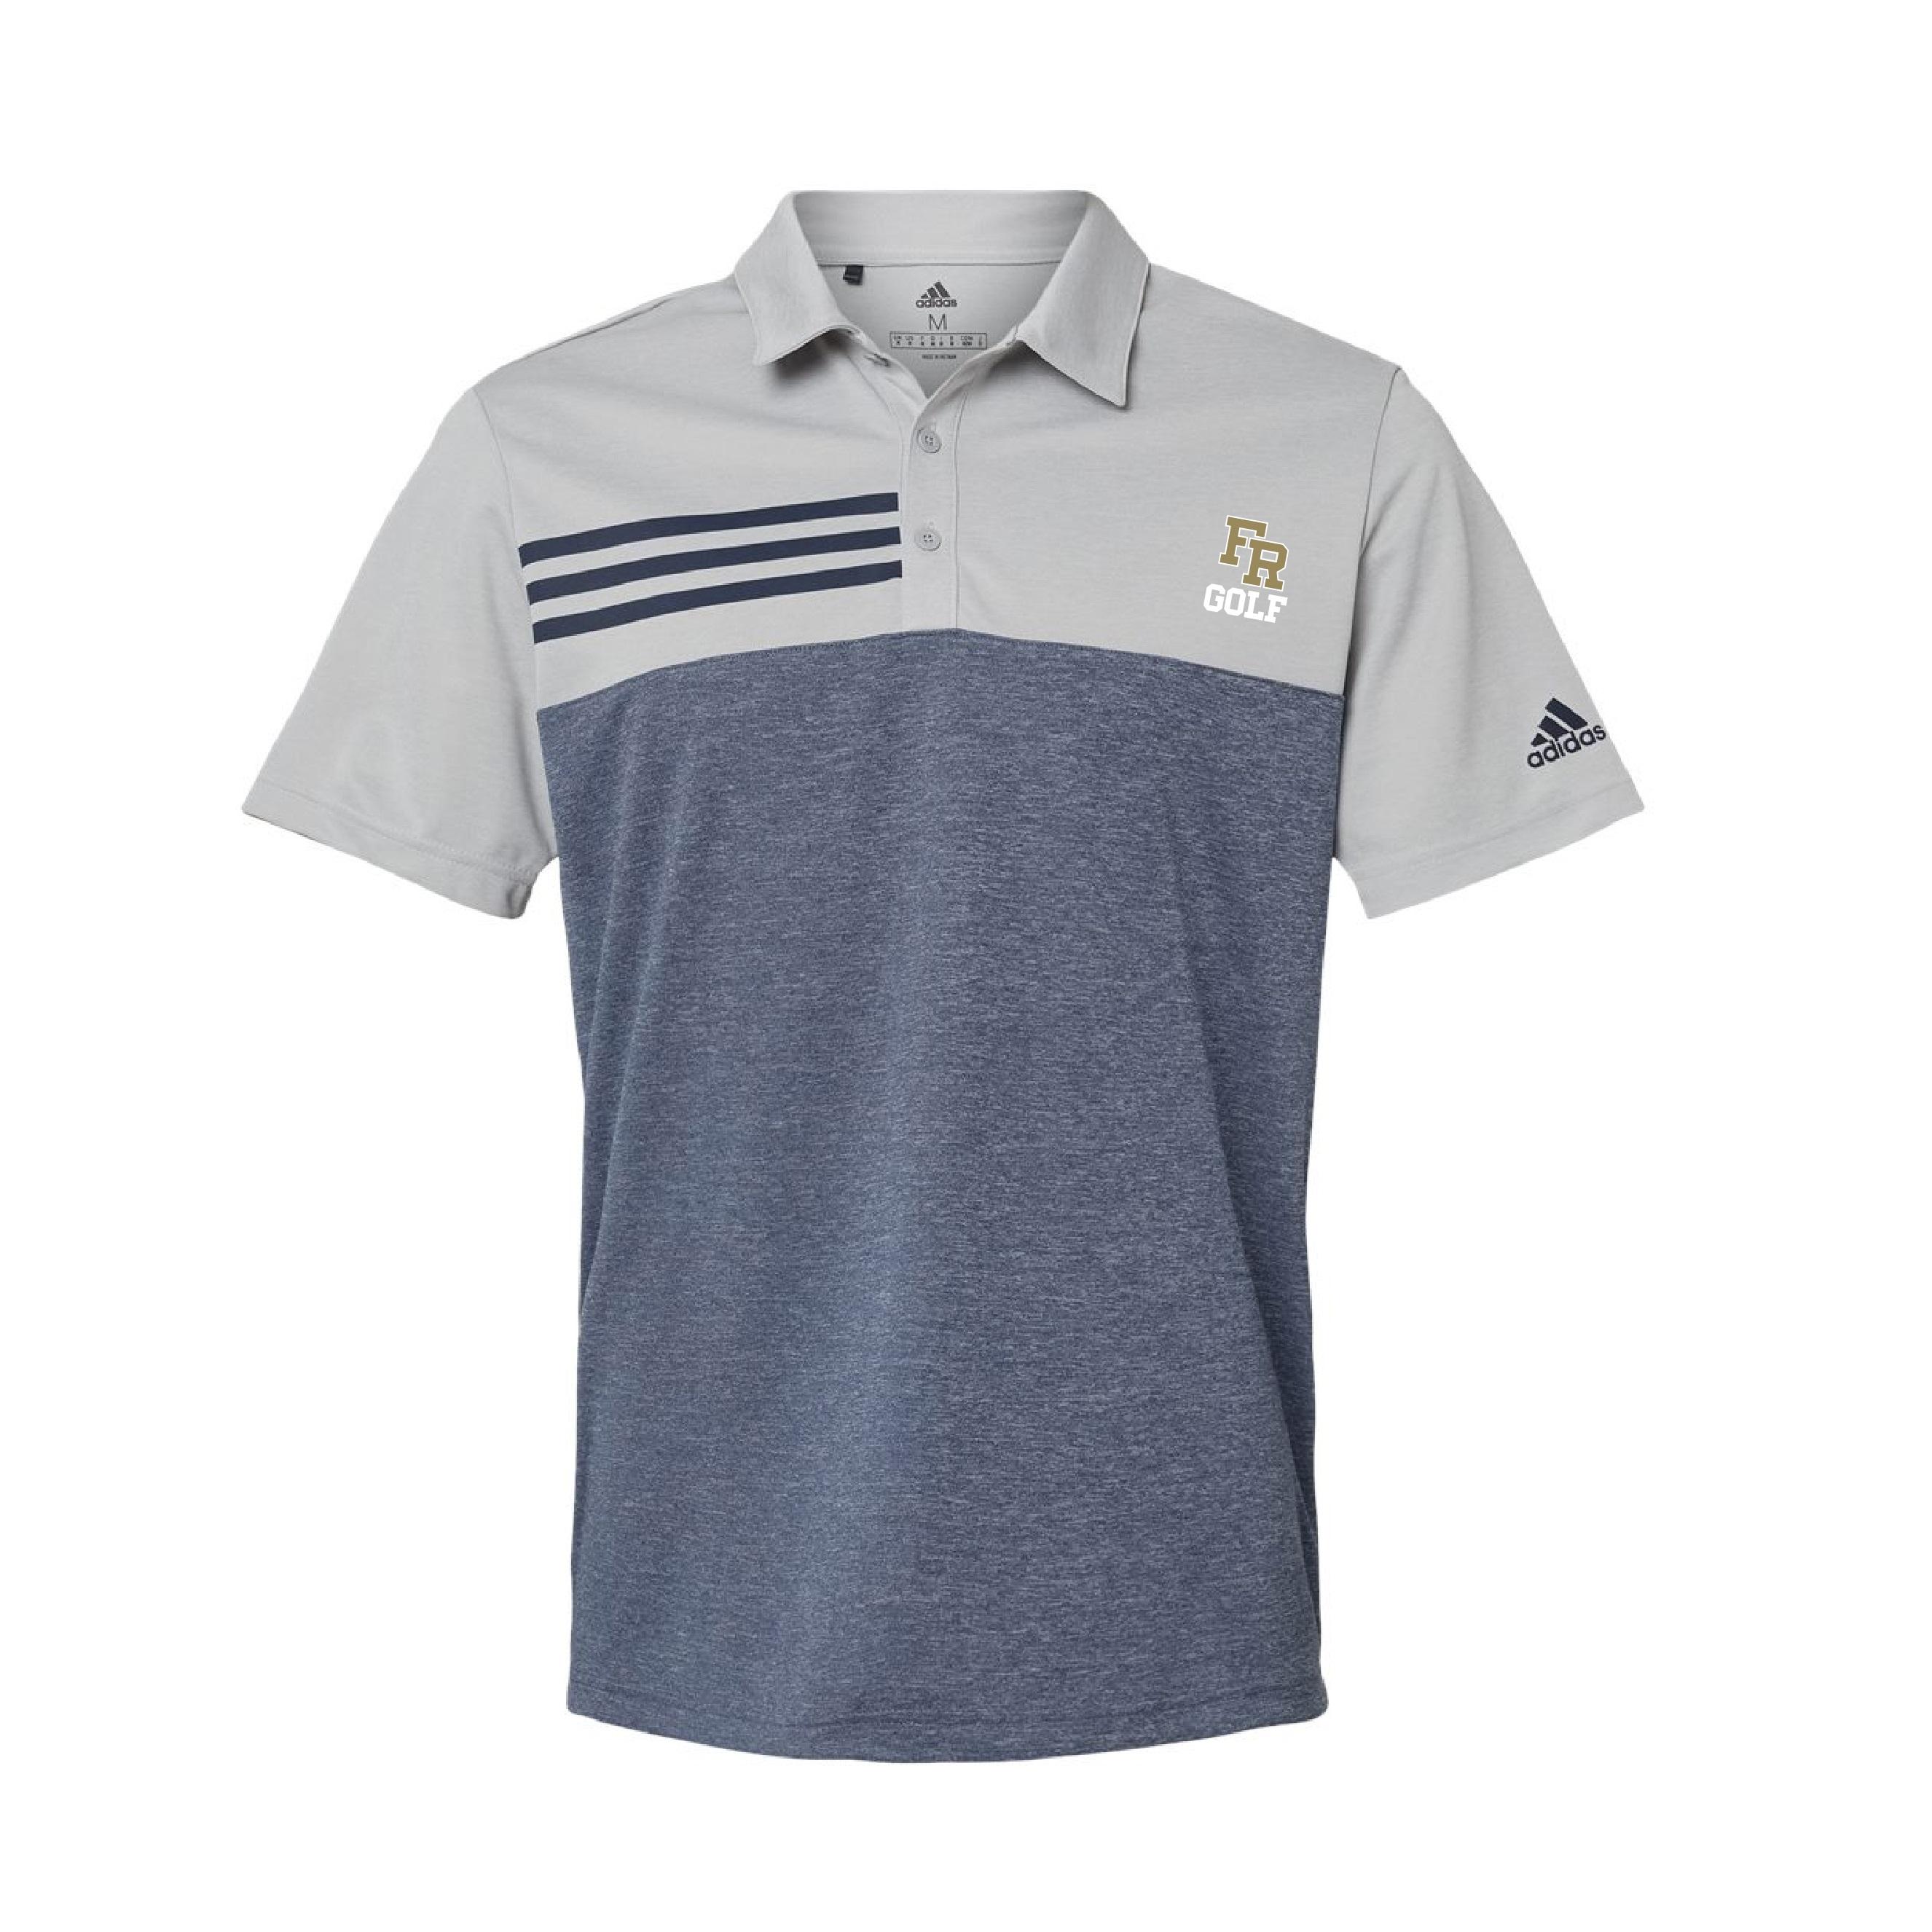 Adidas Heathered Colorblock Sport Shirt